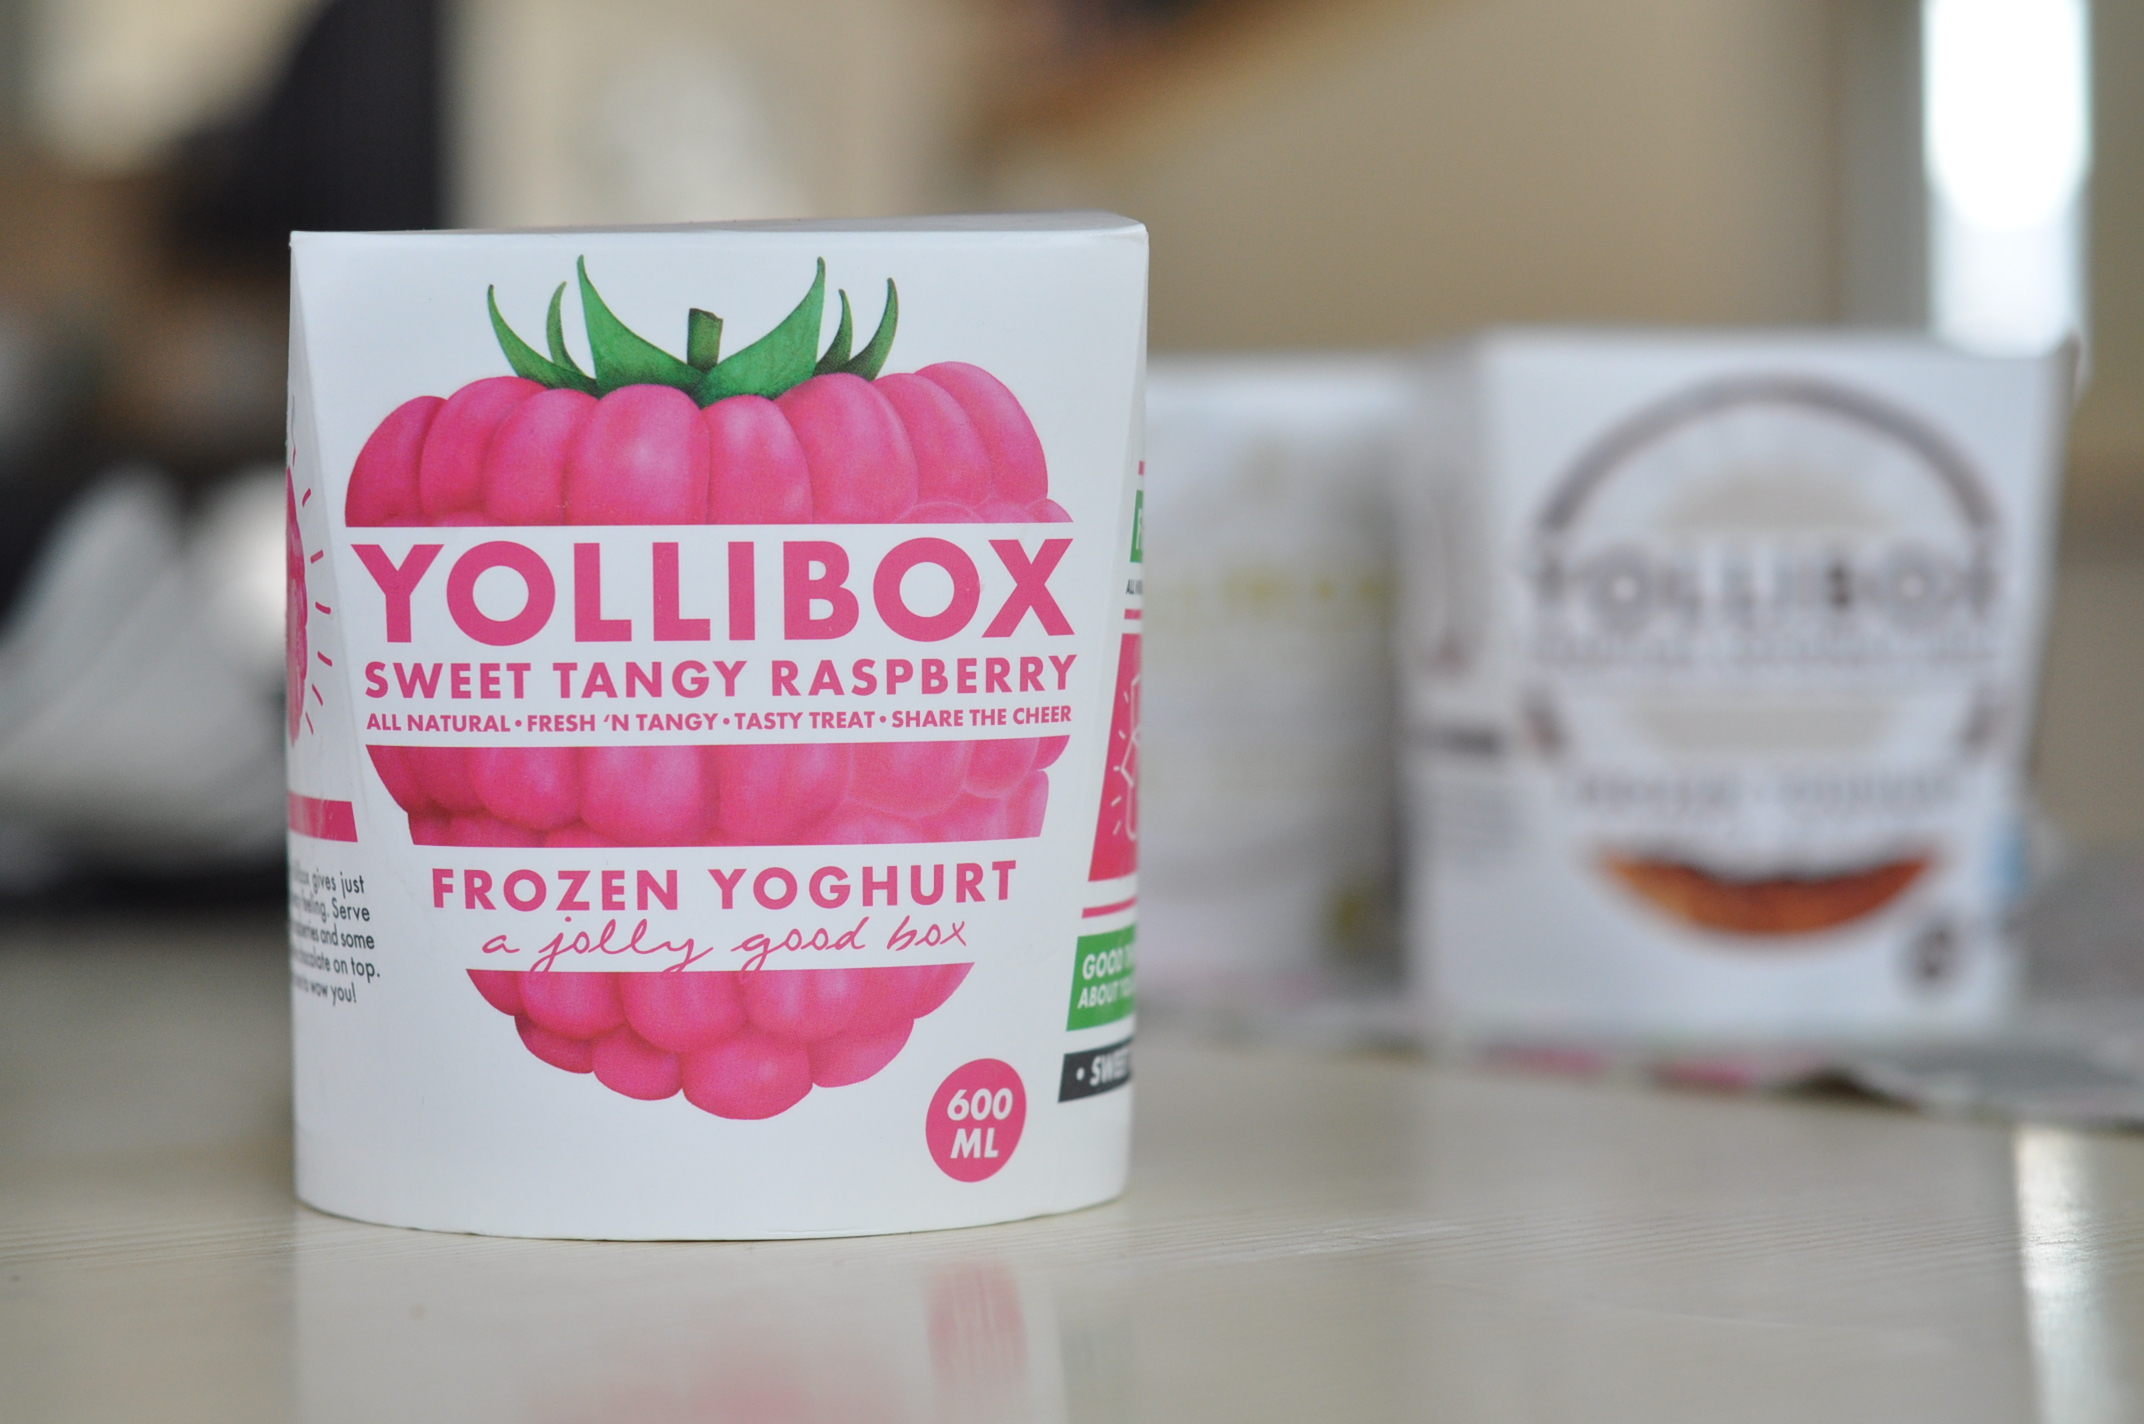 Yollibox Sweet Tangy Raspberry